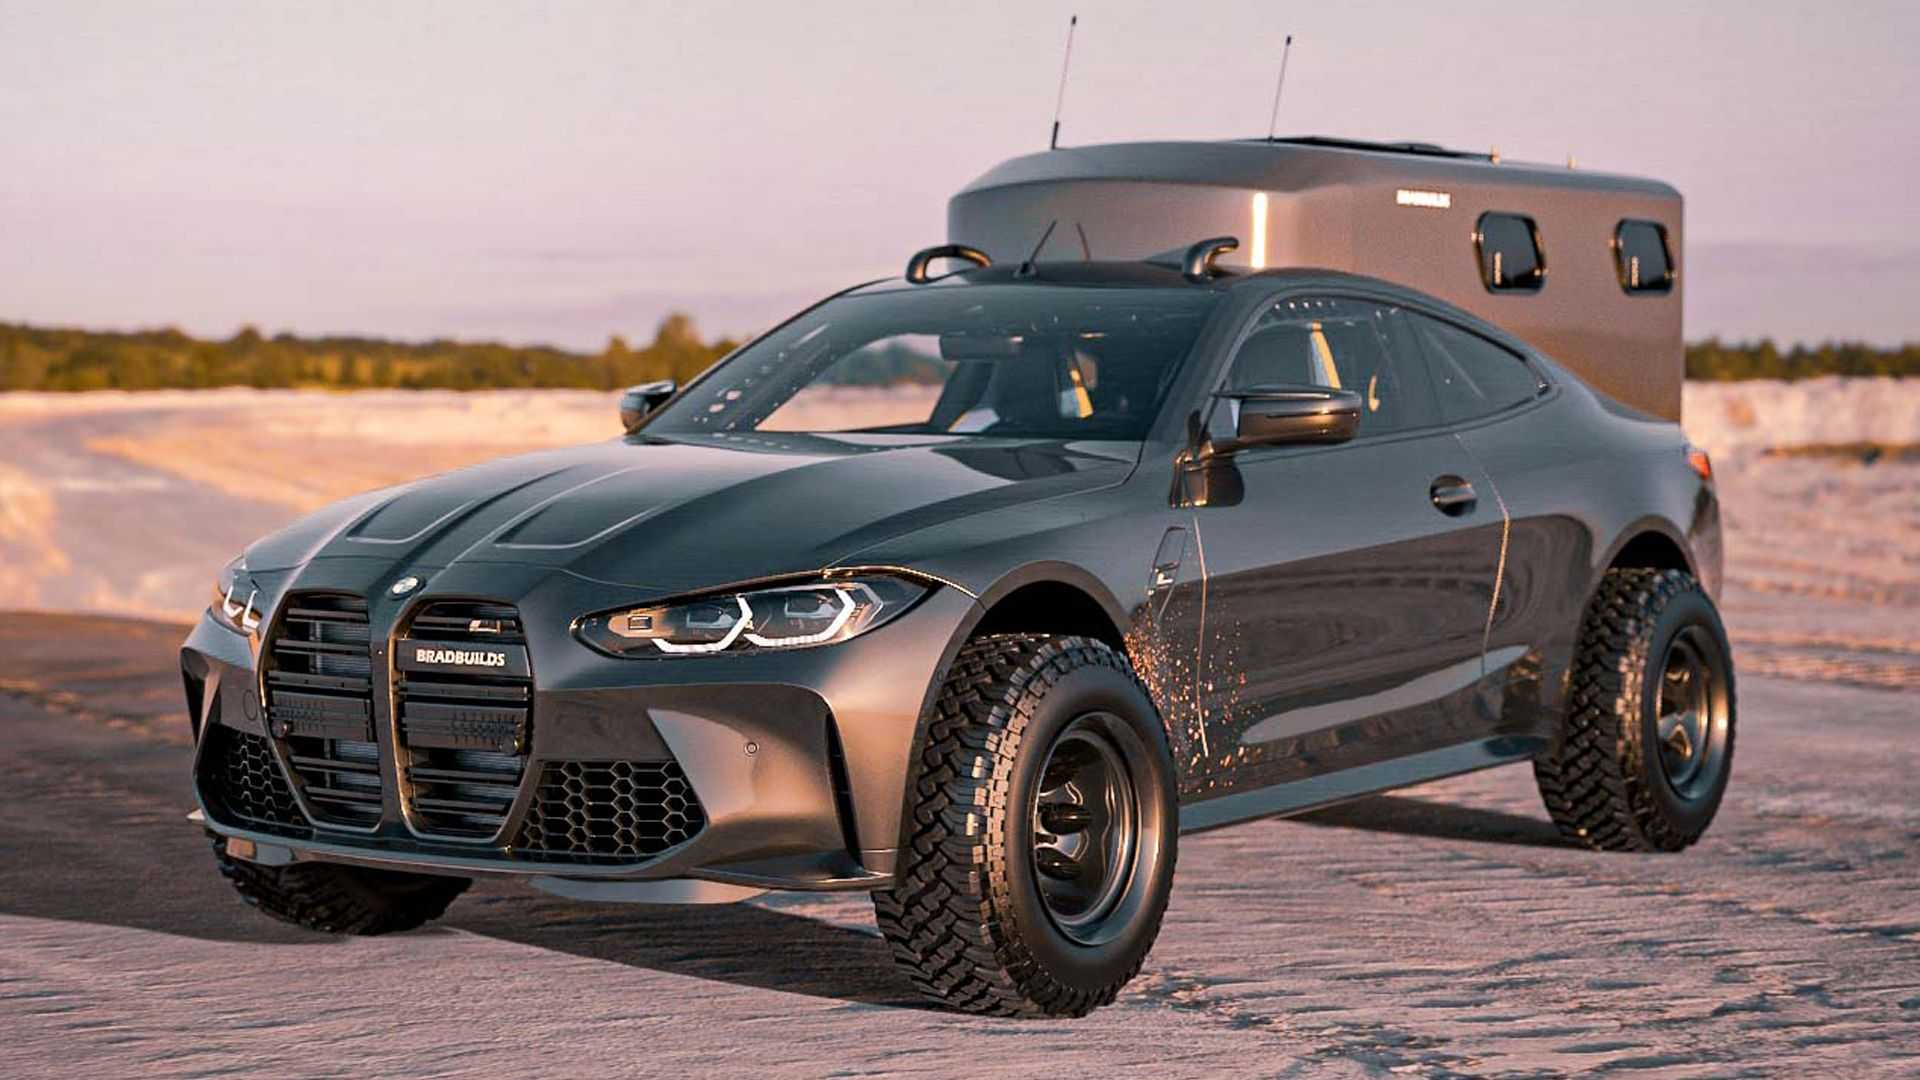 BMW M4 Baja Overlander